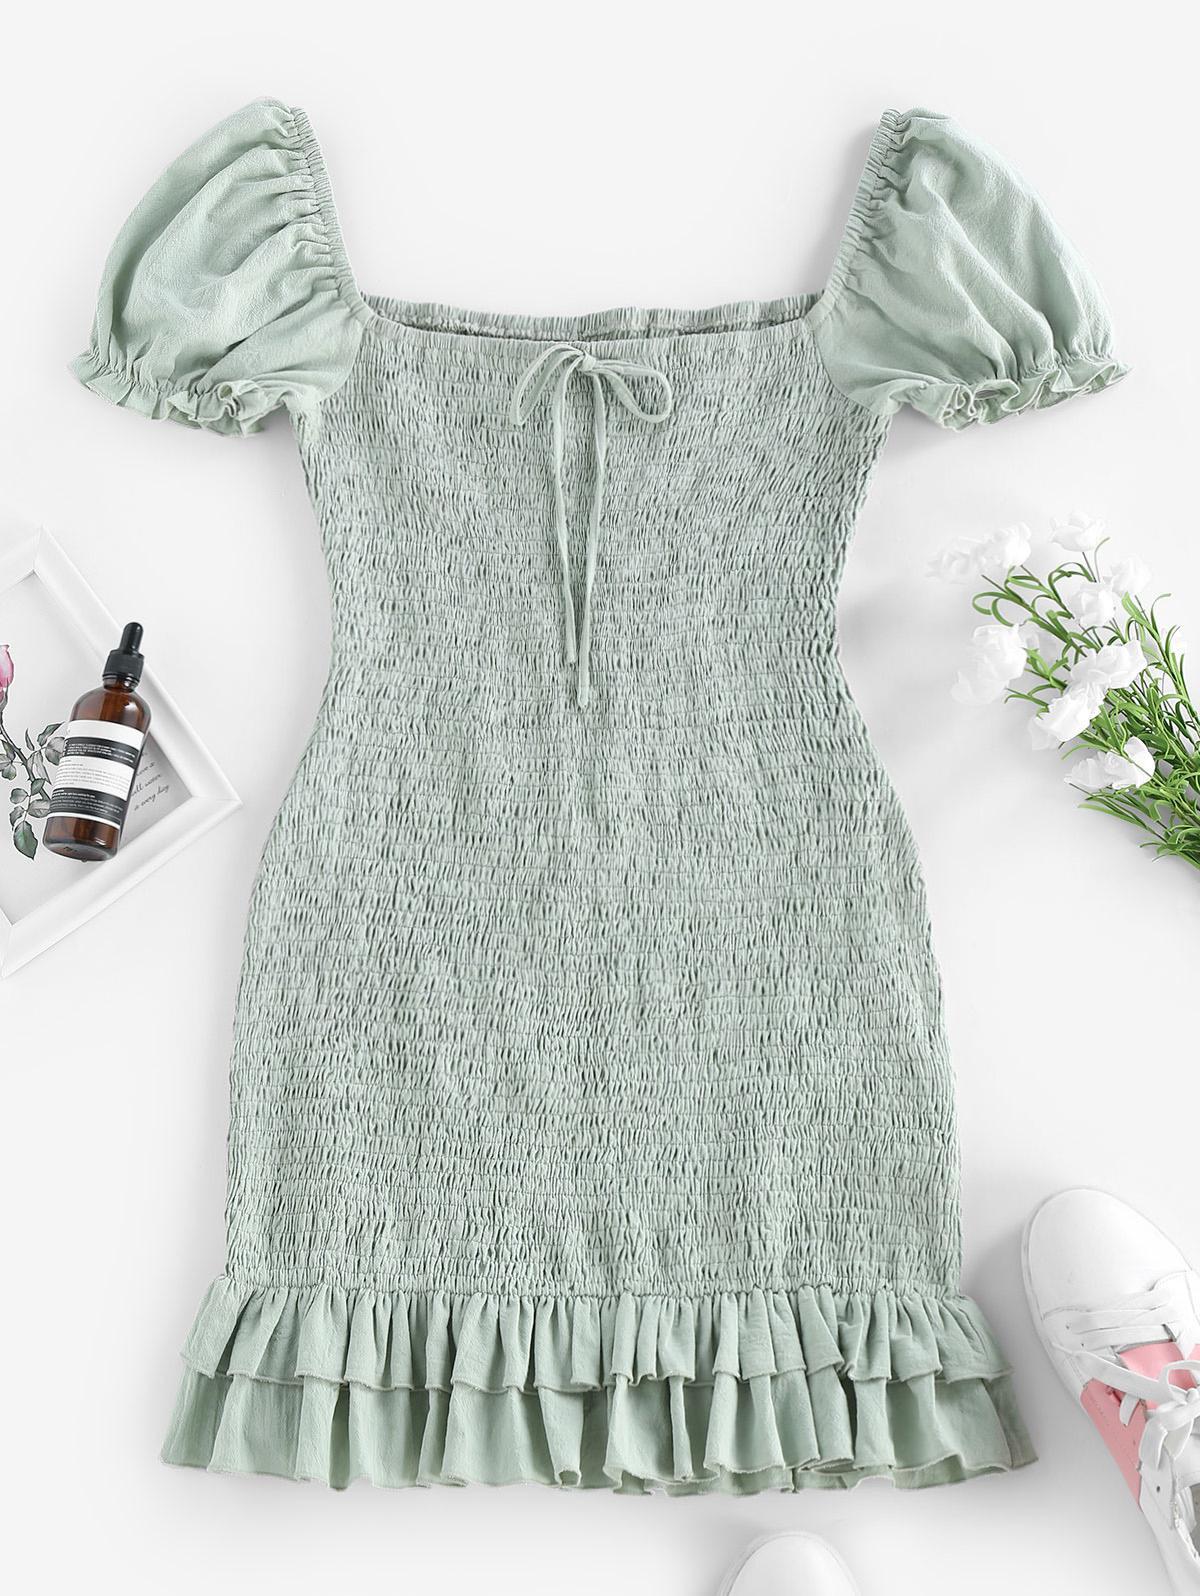 ZAFUL Smocked Bowknot Mermaid Mini Dress thumbnail